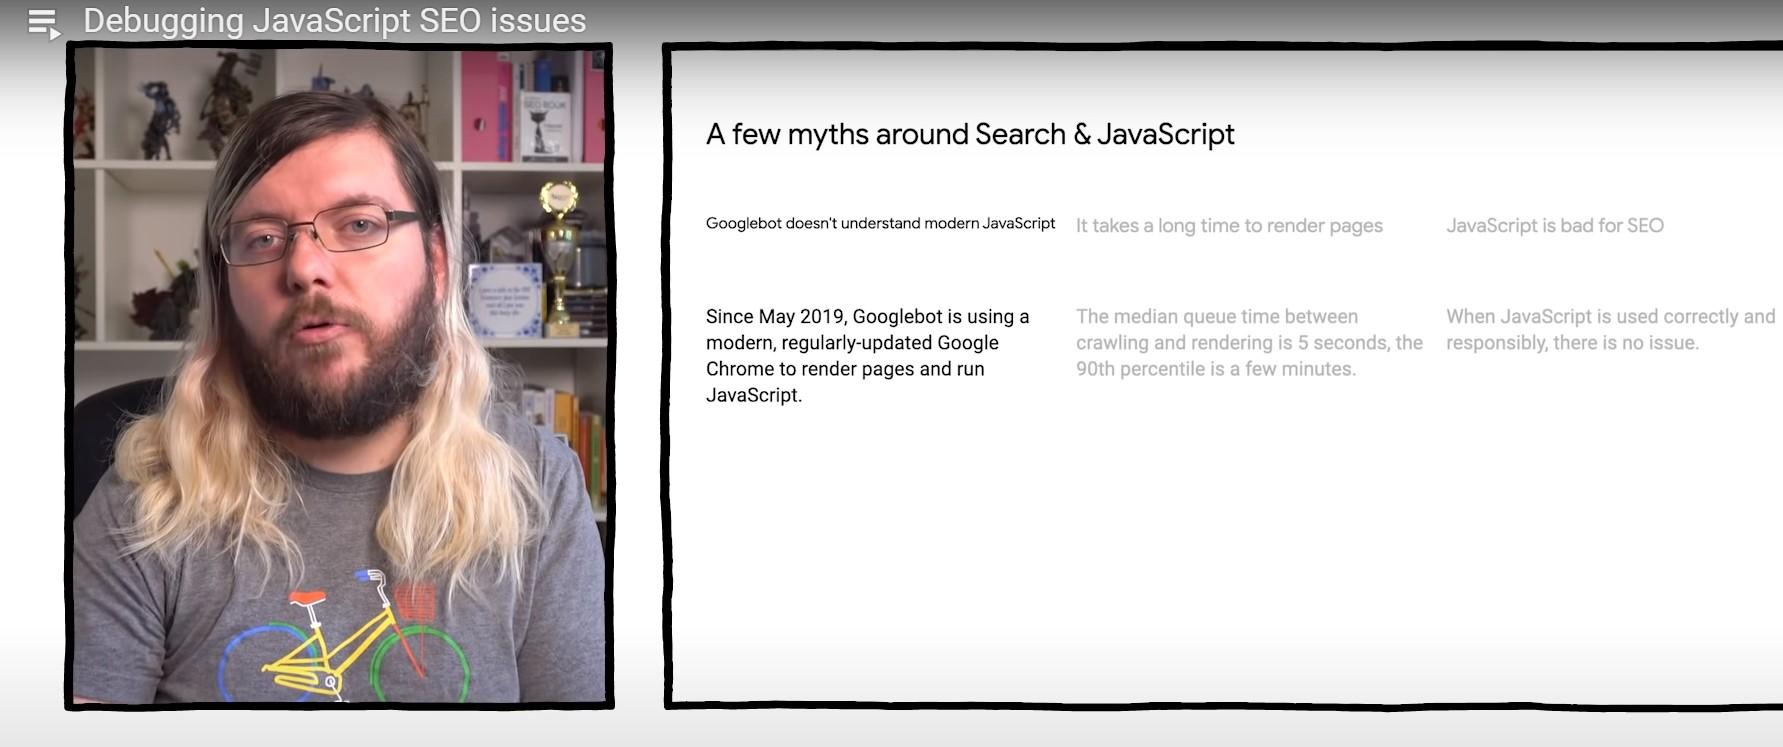 Debugging JavaScript SEO issues – Martin Splitt